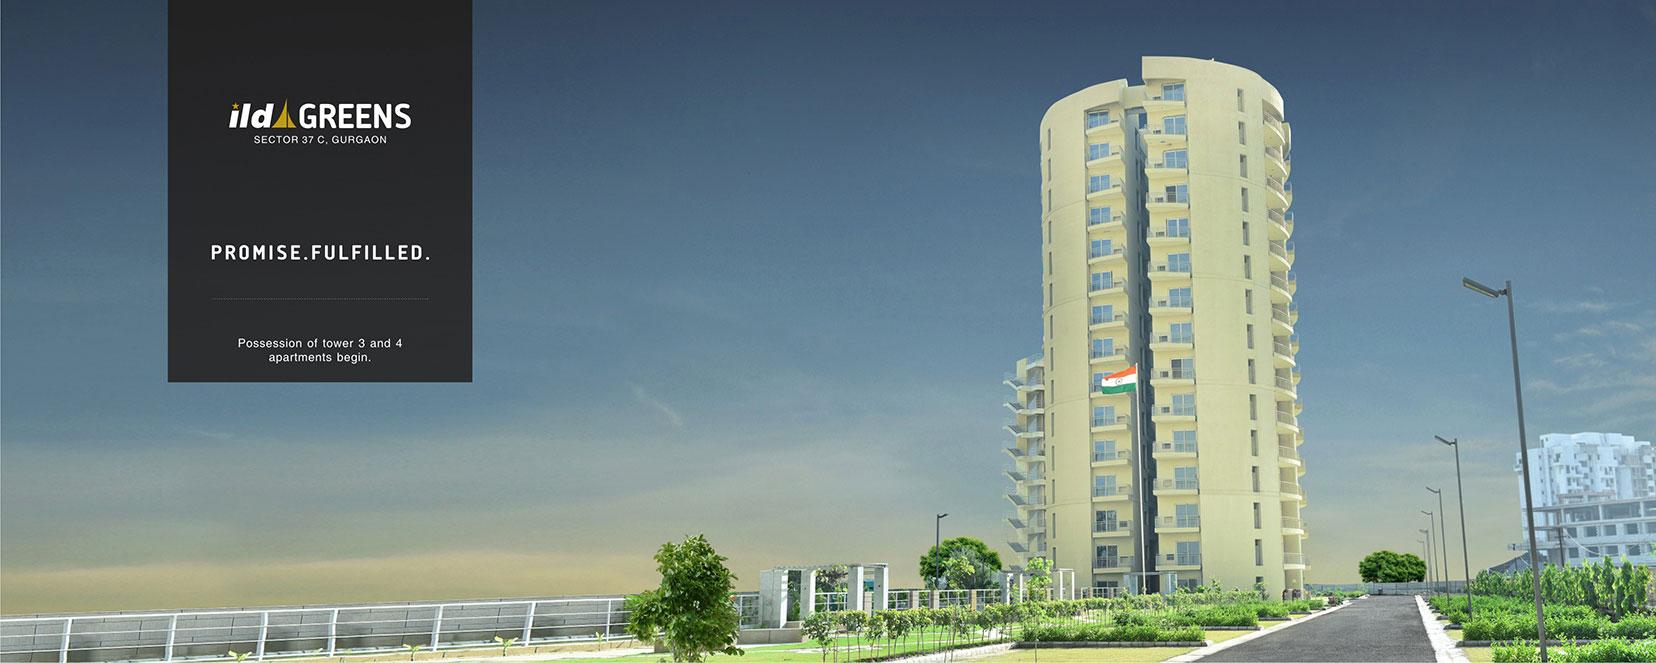 Top Real Estate Developer in Gurgaon & Delhi NCR